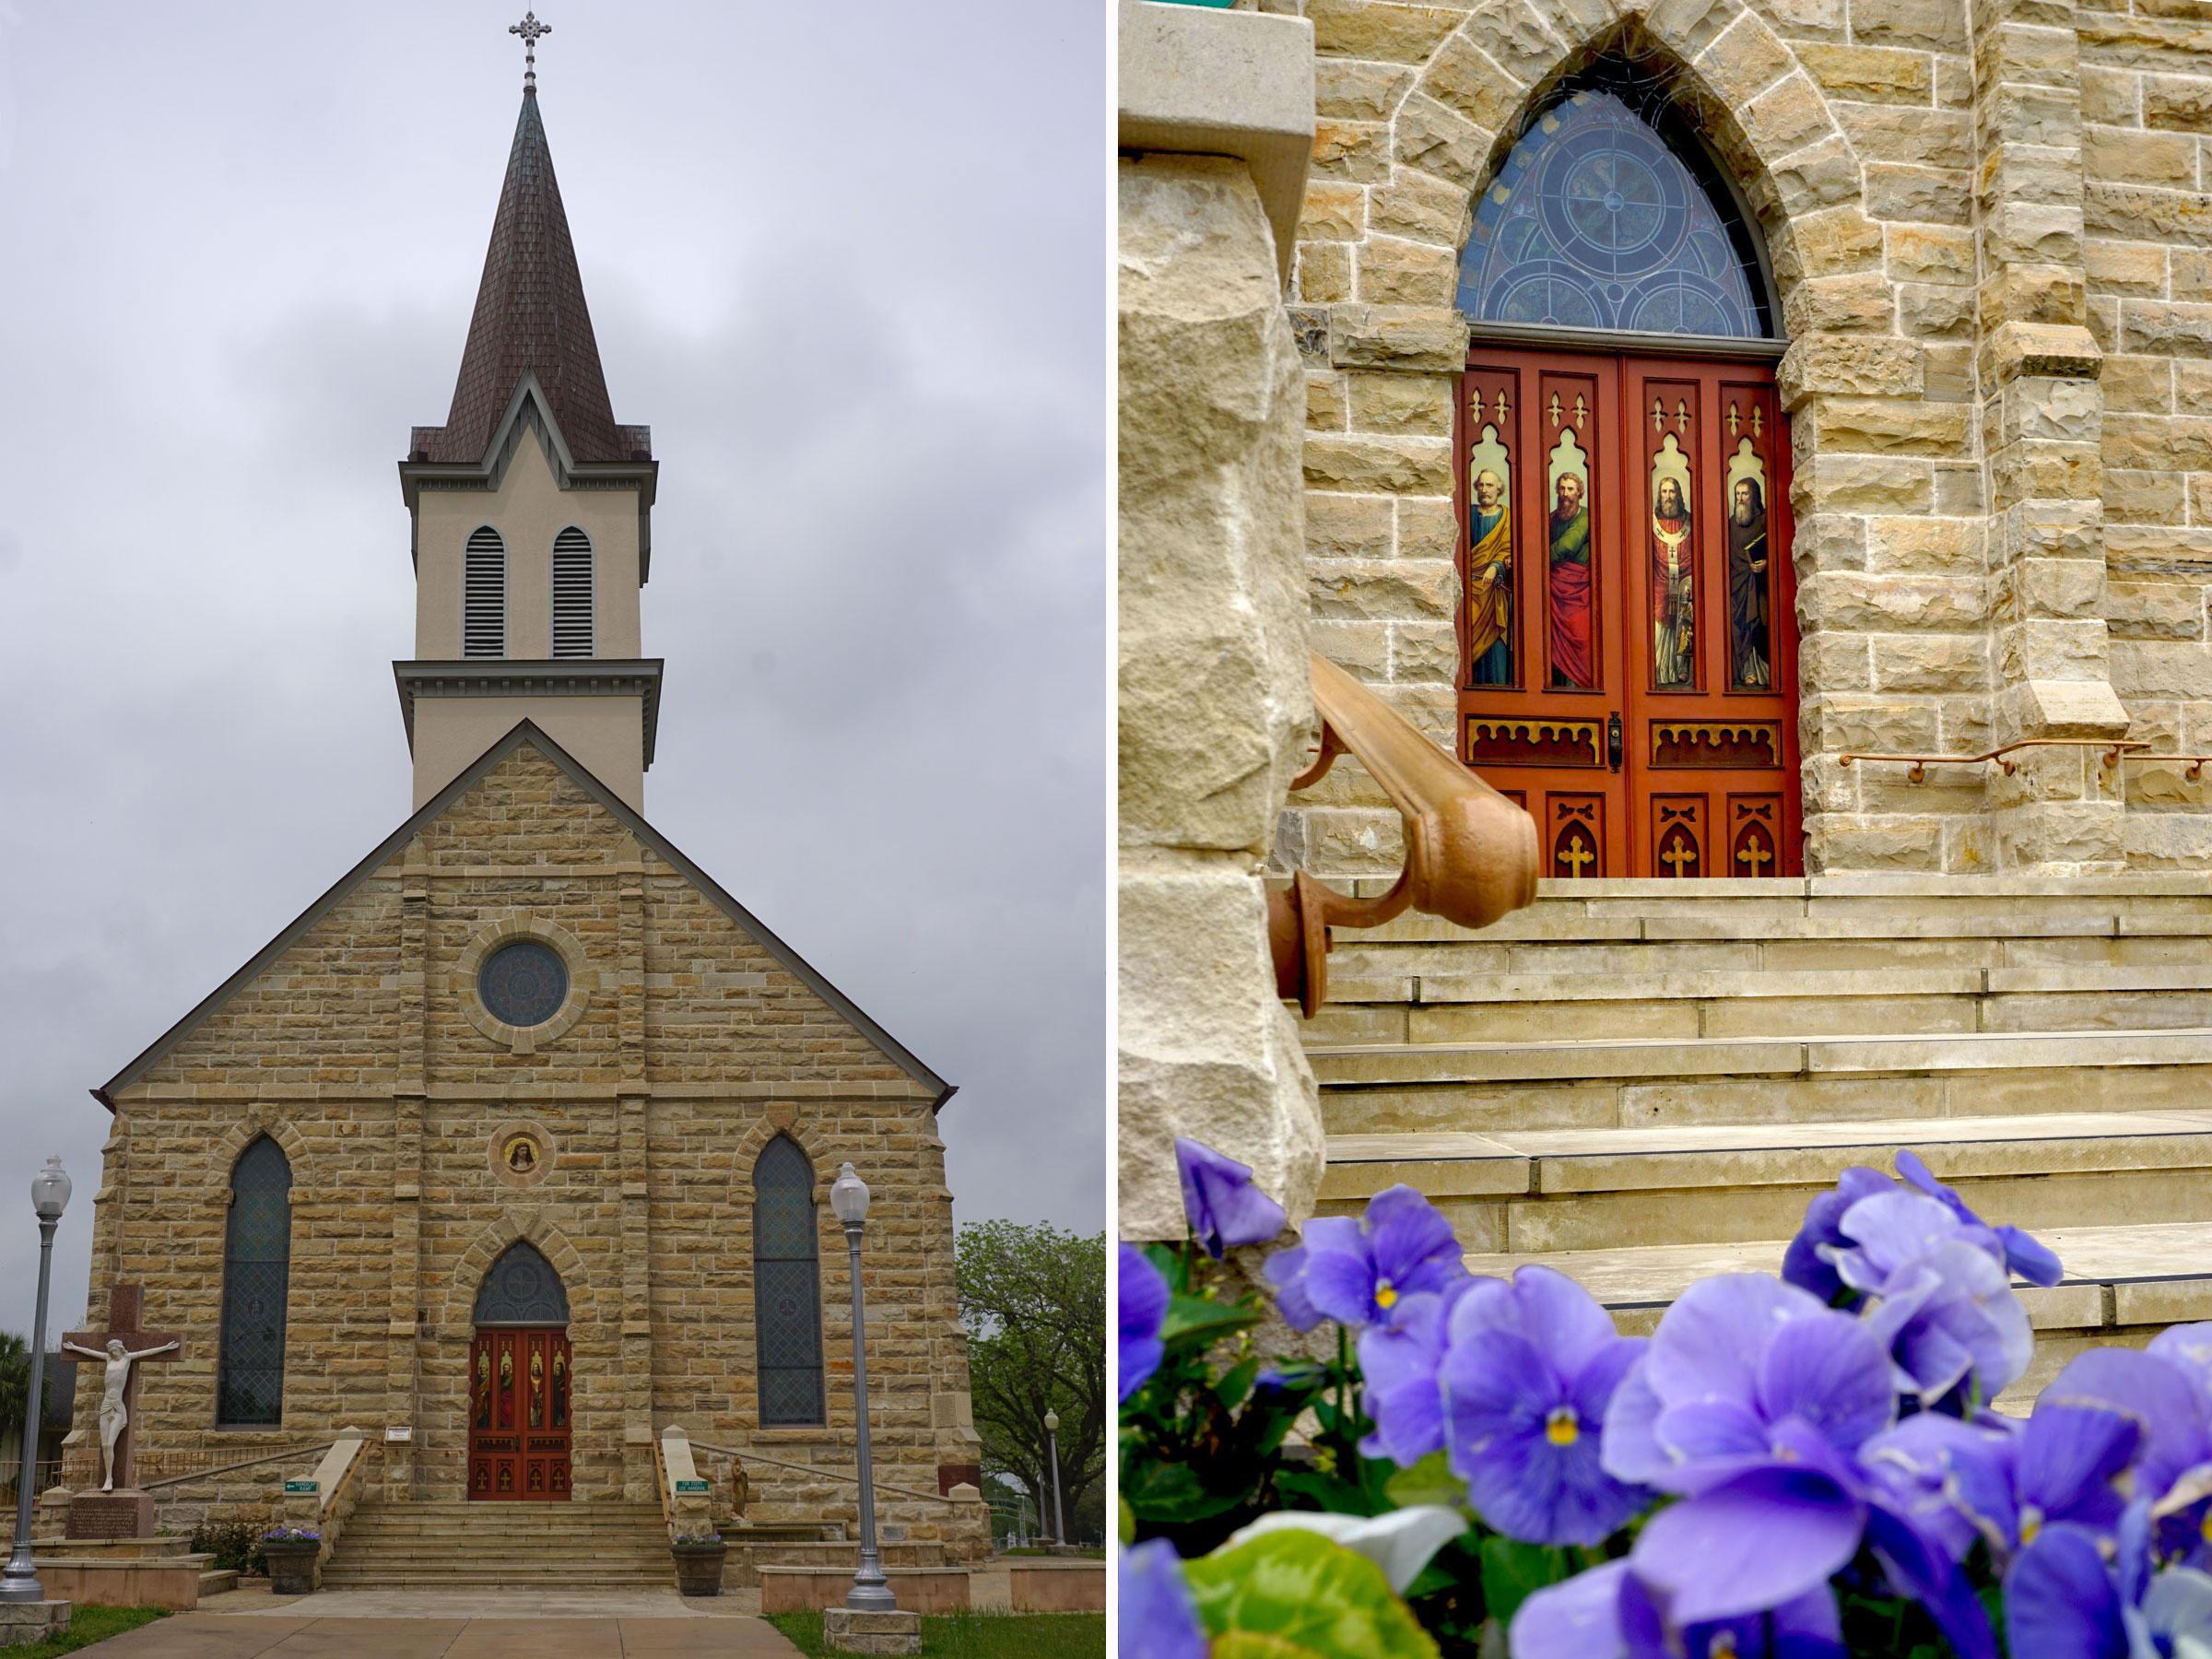 © 2019 Louise Levergneux. St. Mary's Church received a current exterior from stones quarried nearby in Muldoon in Texas. /  L'Église Sainte Marie reçoit un extérieur de pierres extraites dans les environs de Muldoon au Texas.